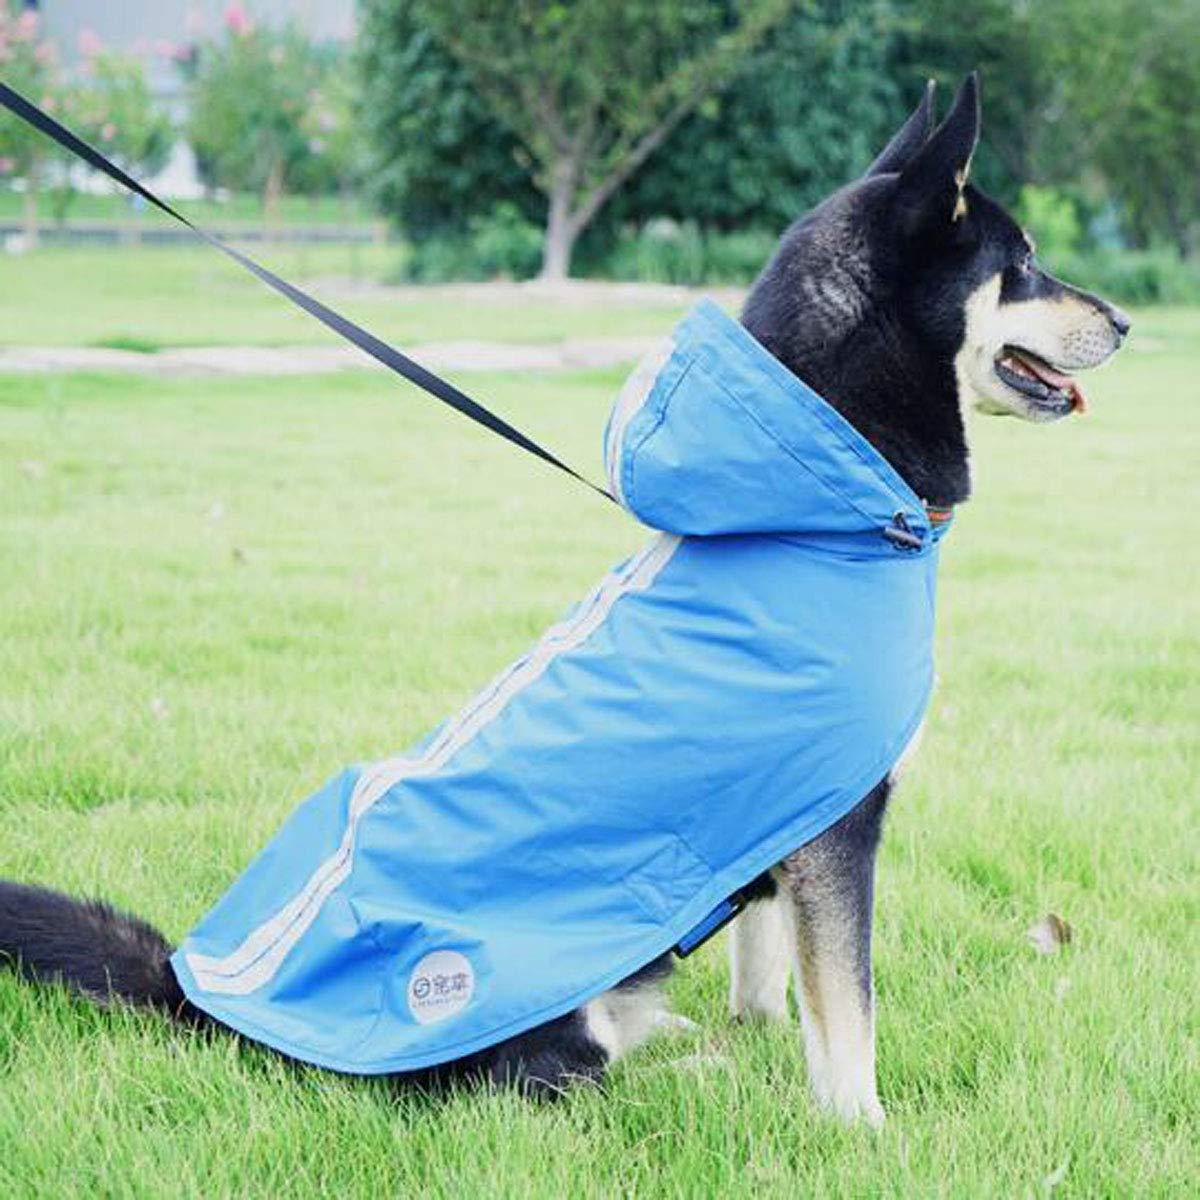 bluee L bluee L Jiansheng Pet Dog Waterproof Suit, golden Retriever Dog, Medium And Large Dog, Jacket Raincoat (color   bluee, Size   L)